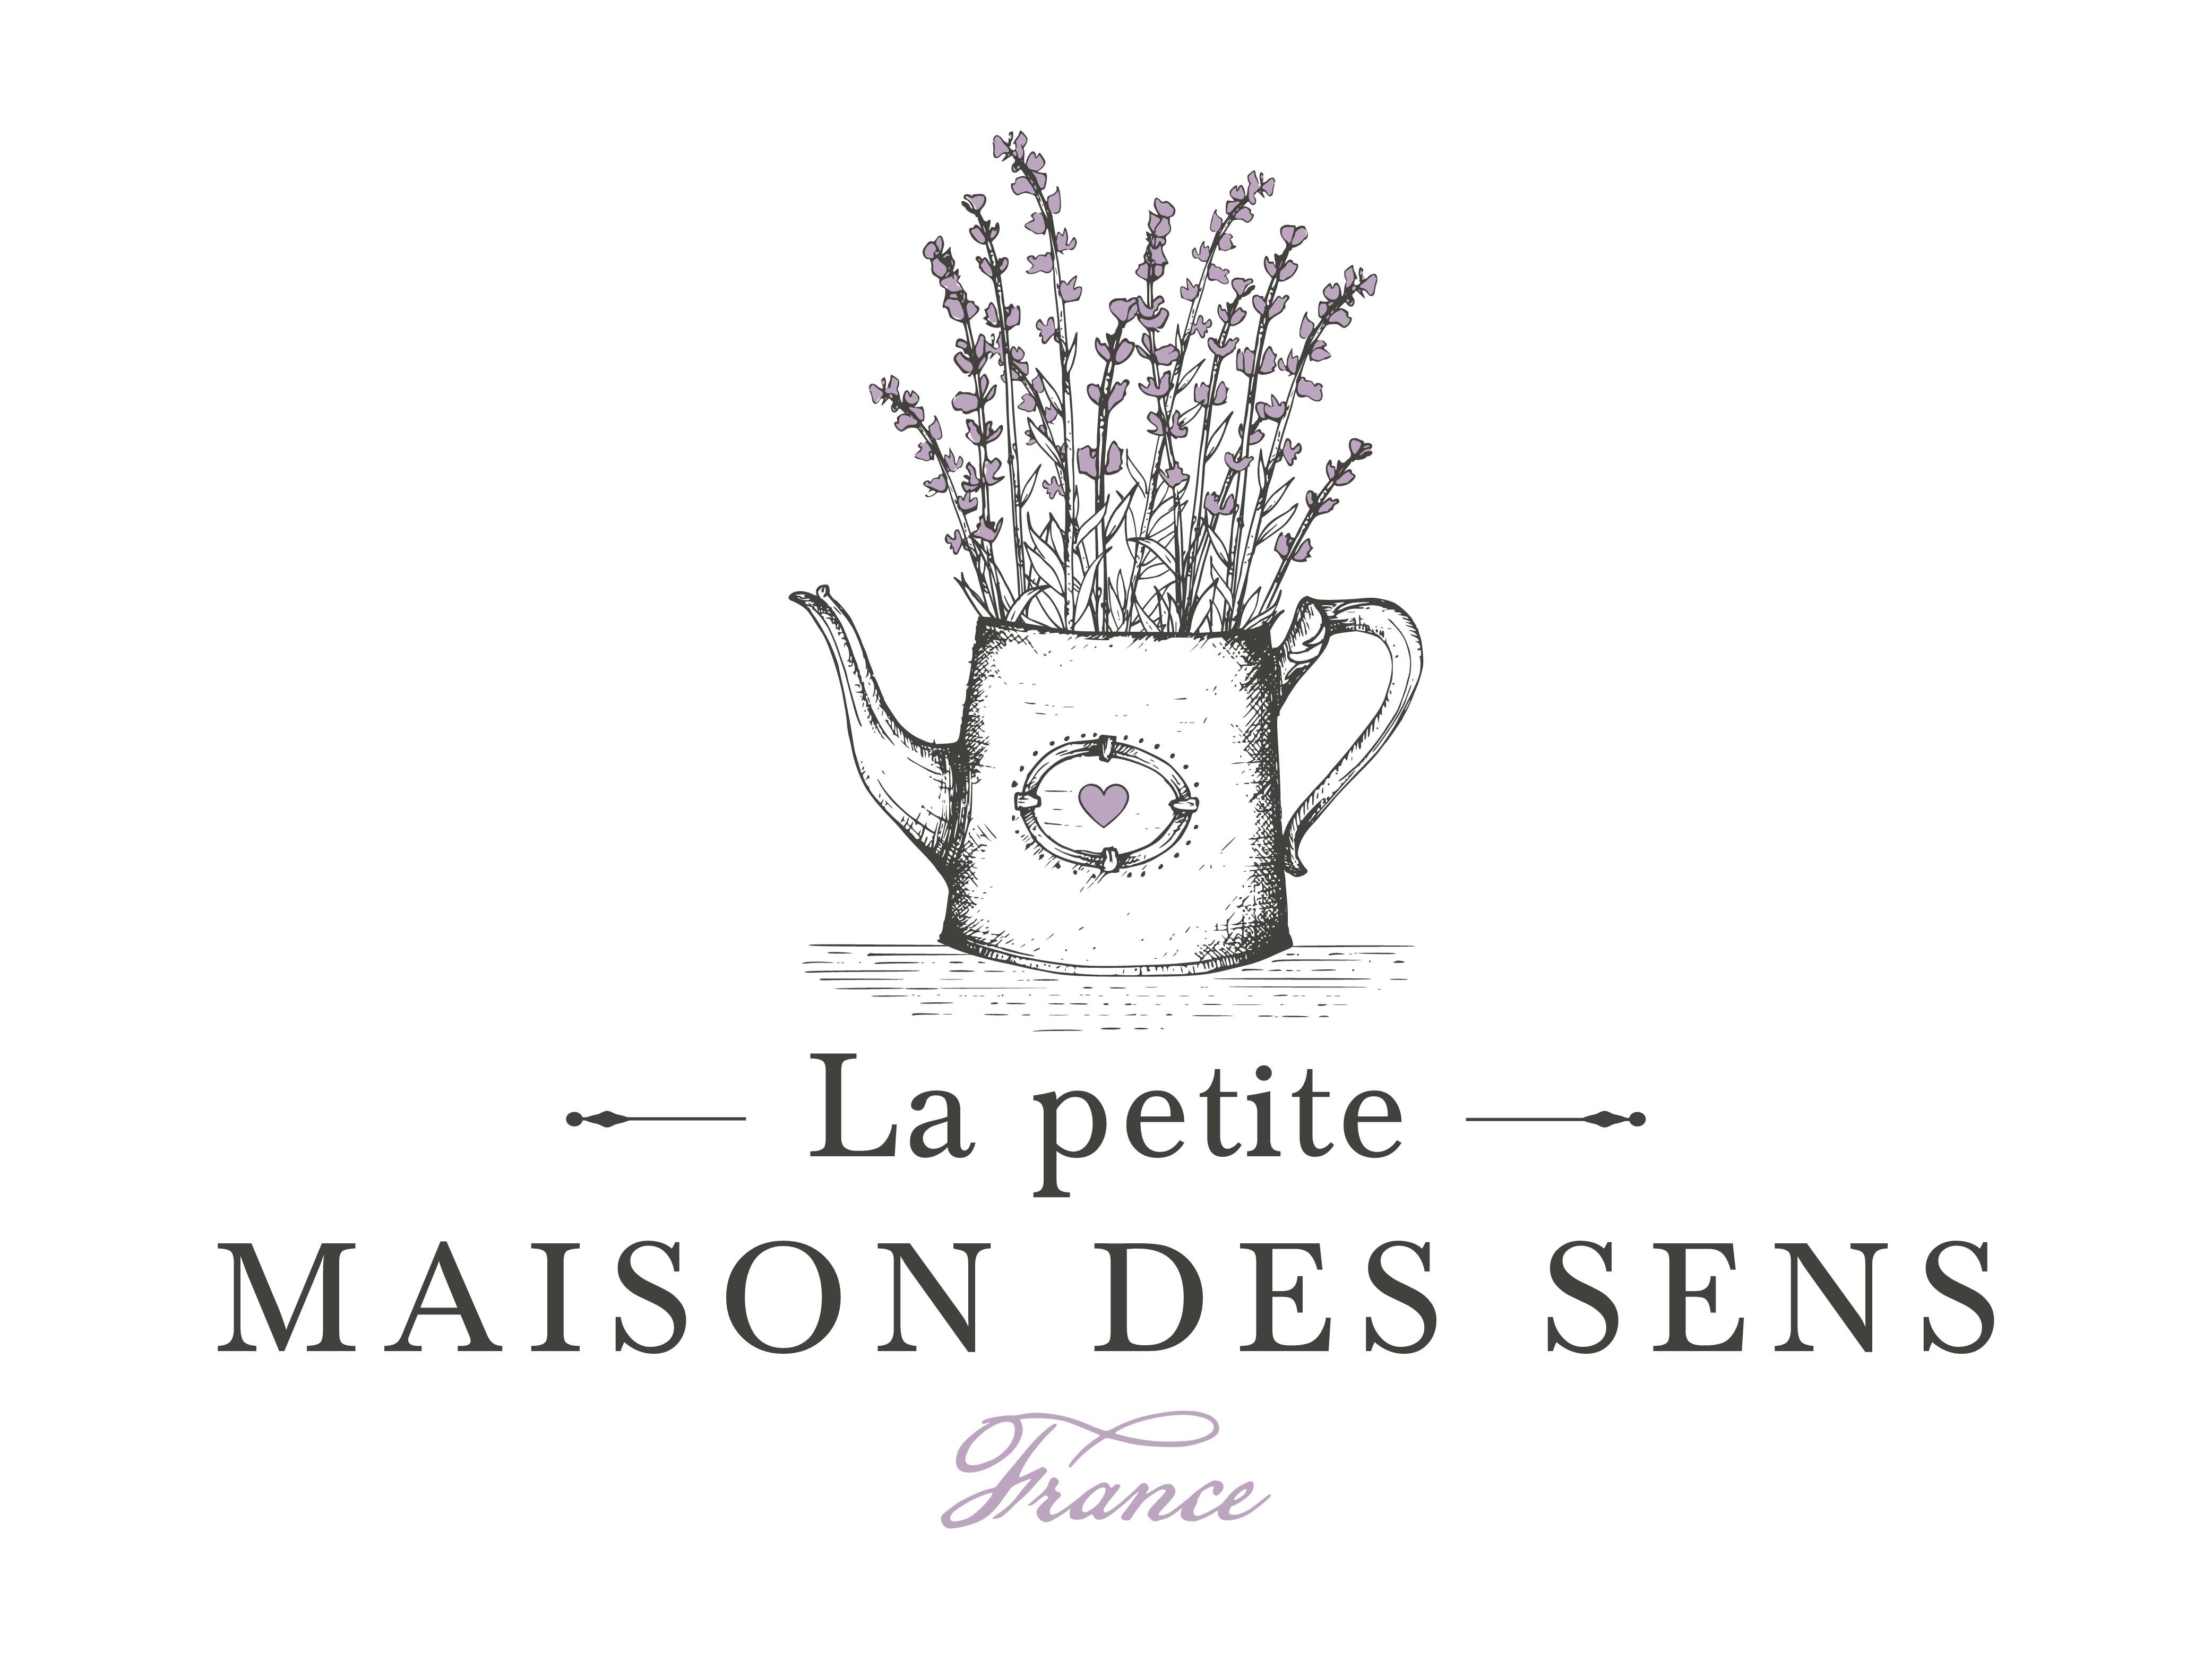 B&B LA PETITE MAISON DES SENS in Provence (France) needs a romatic logo!